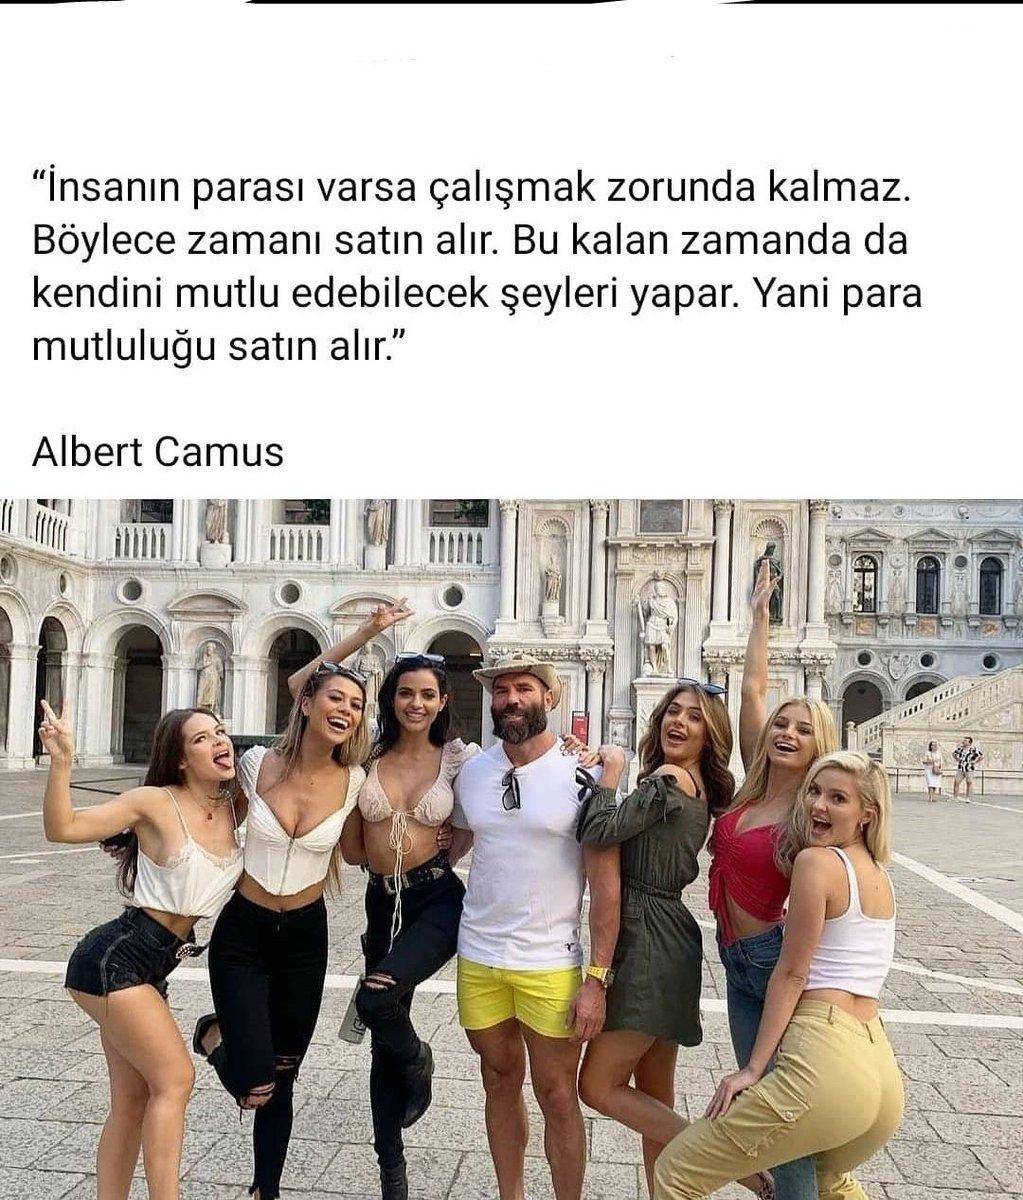 #BorsaIstanbul #sasa #hekts #merit #btc #bnb #ıota #cripto